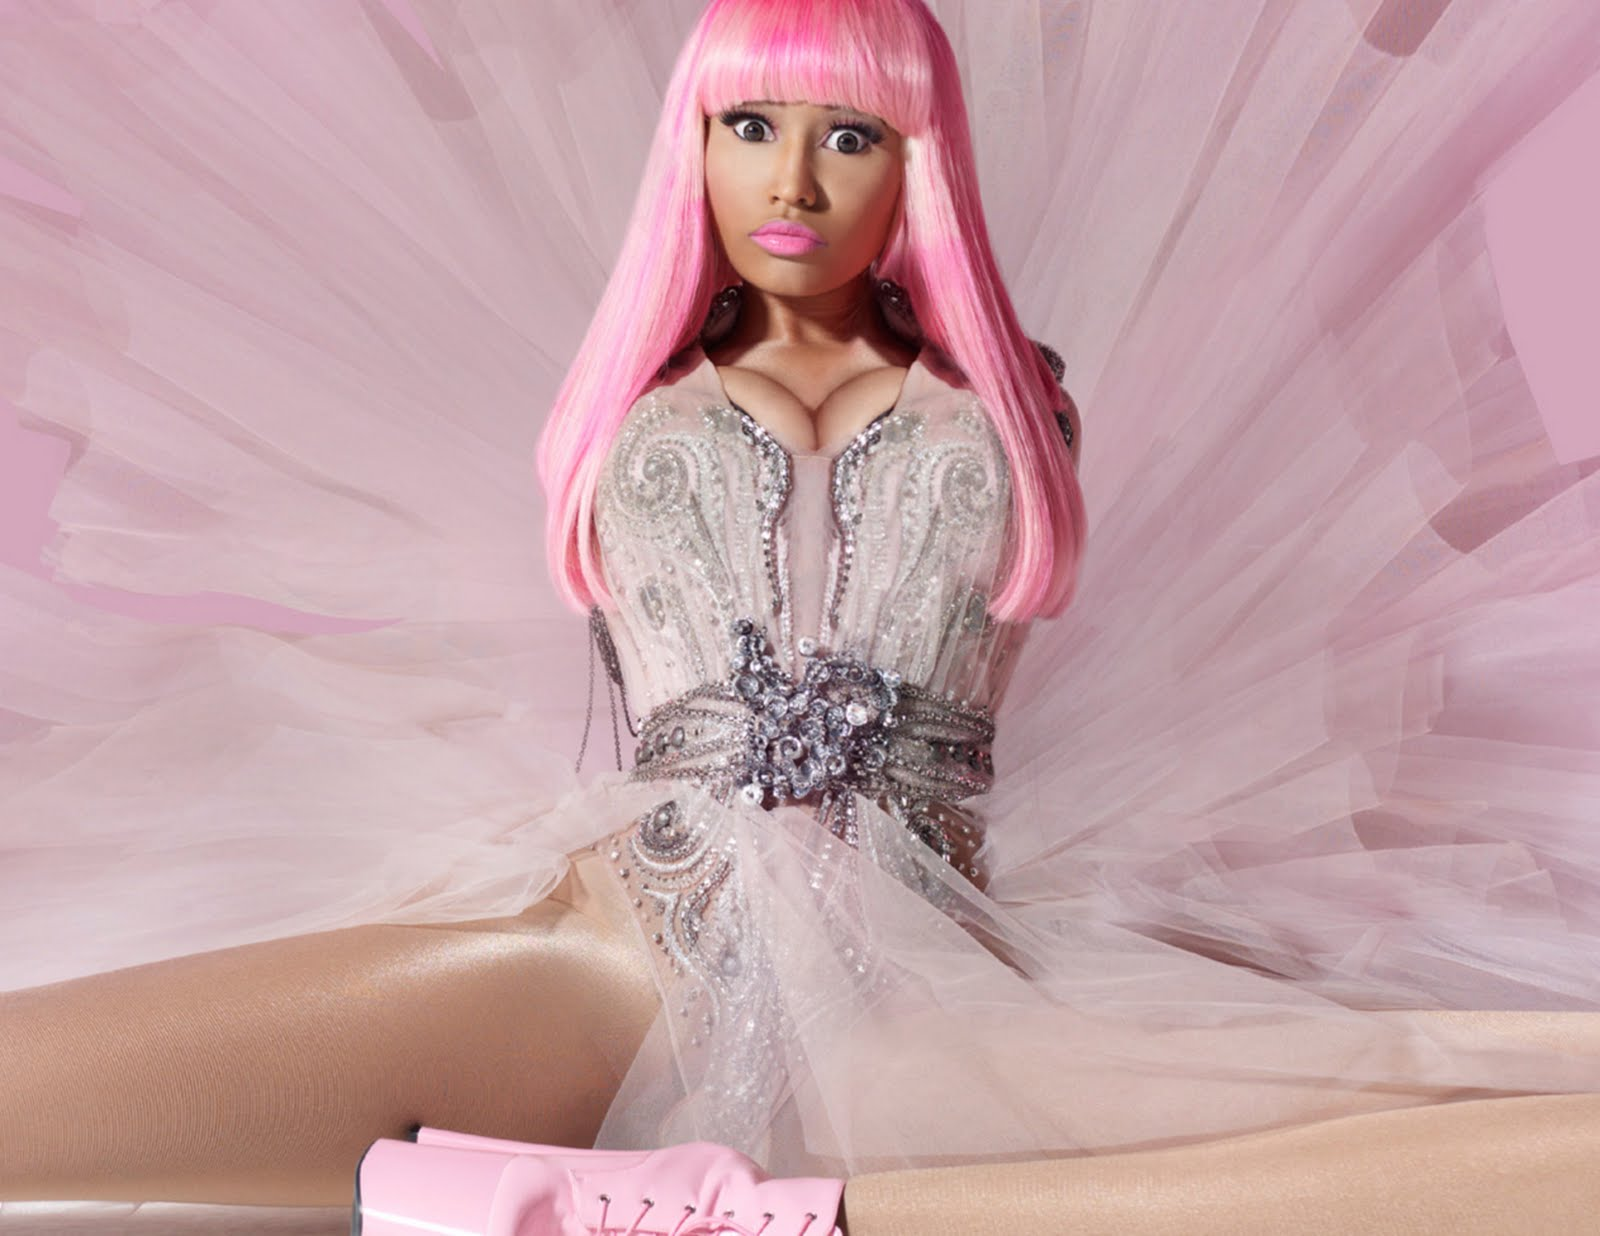 http://2.bp.blogspot.com/_b-1f-27HzI0/TO4HNXnkcRI/AAAAAAAAQO4/AkGa8X47iwk/s1600/Pink4Friday-Beauty-300_1.jpg